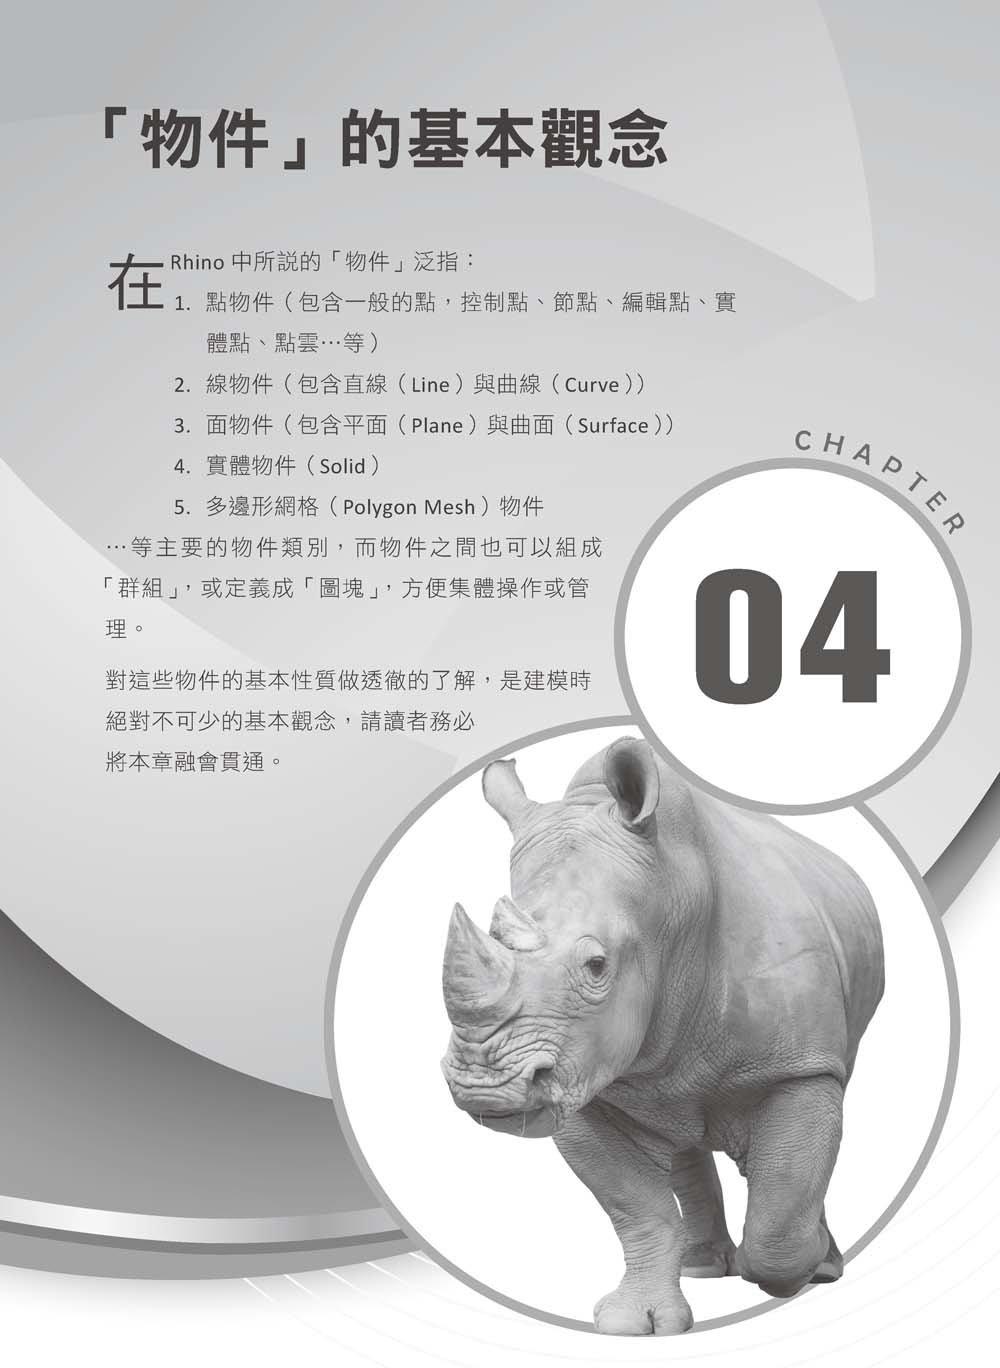 Rhinoceros 6 全攻略:自學設計與 3D建模寶典-preview-18